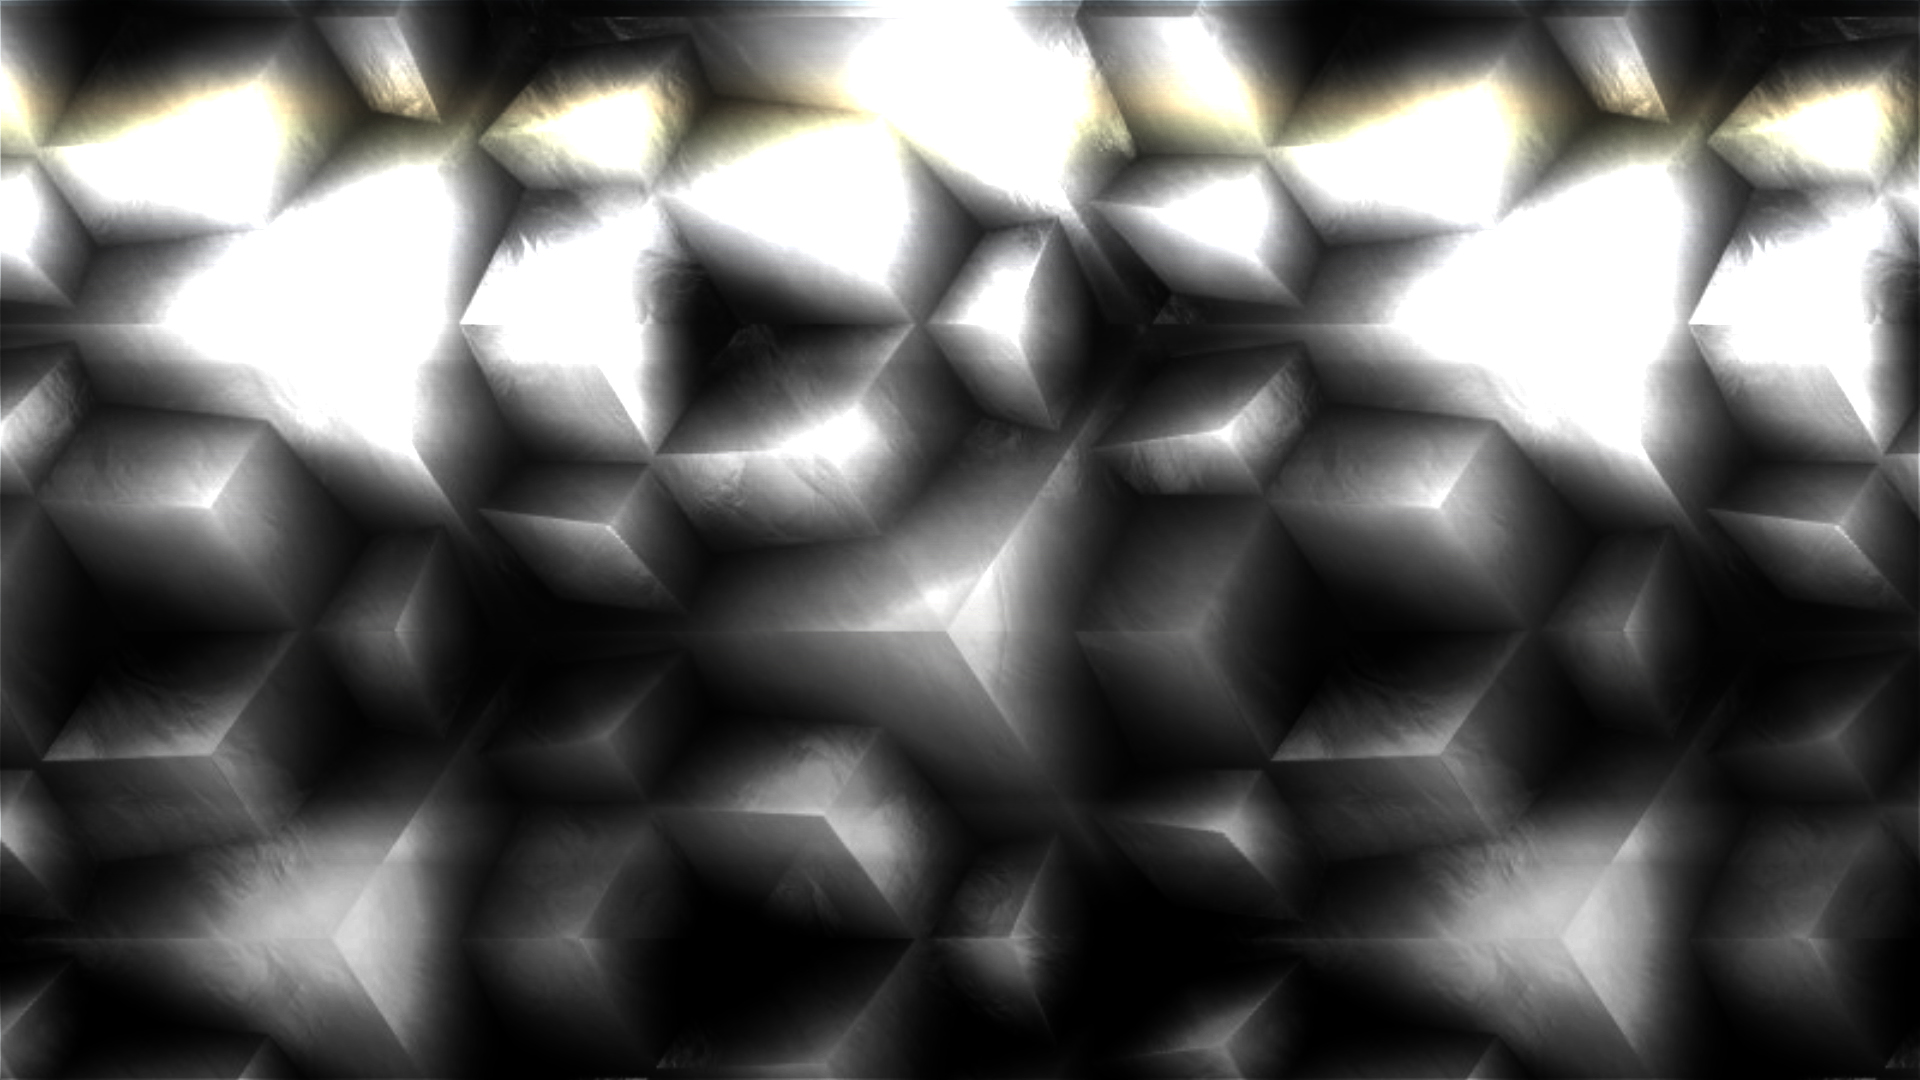 General 1920x1080 3D Abstract cube digital art